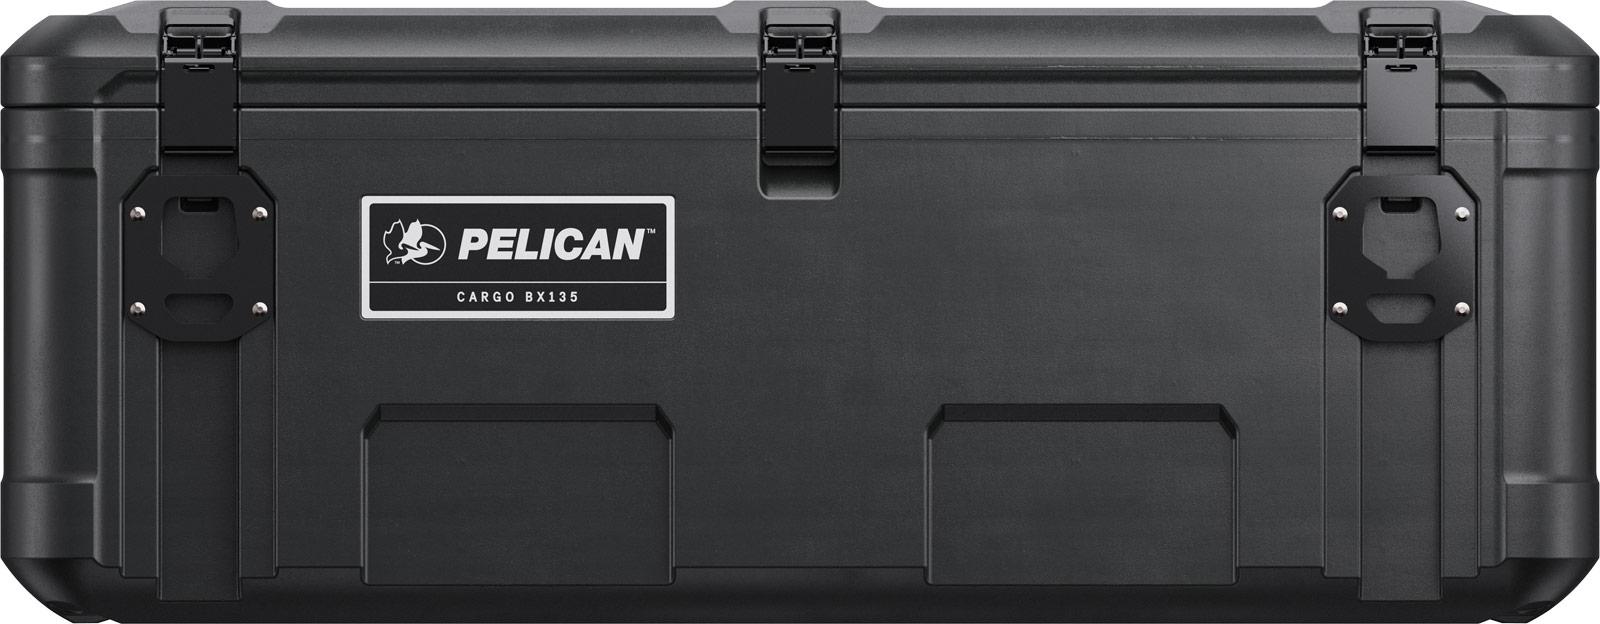 pelican cargo bx135 carrier case